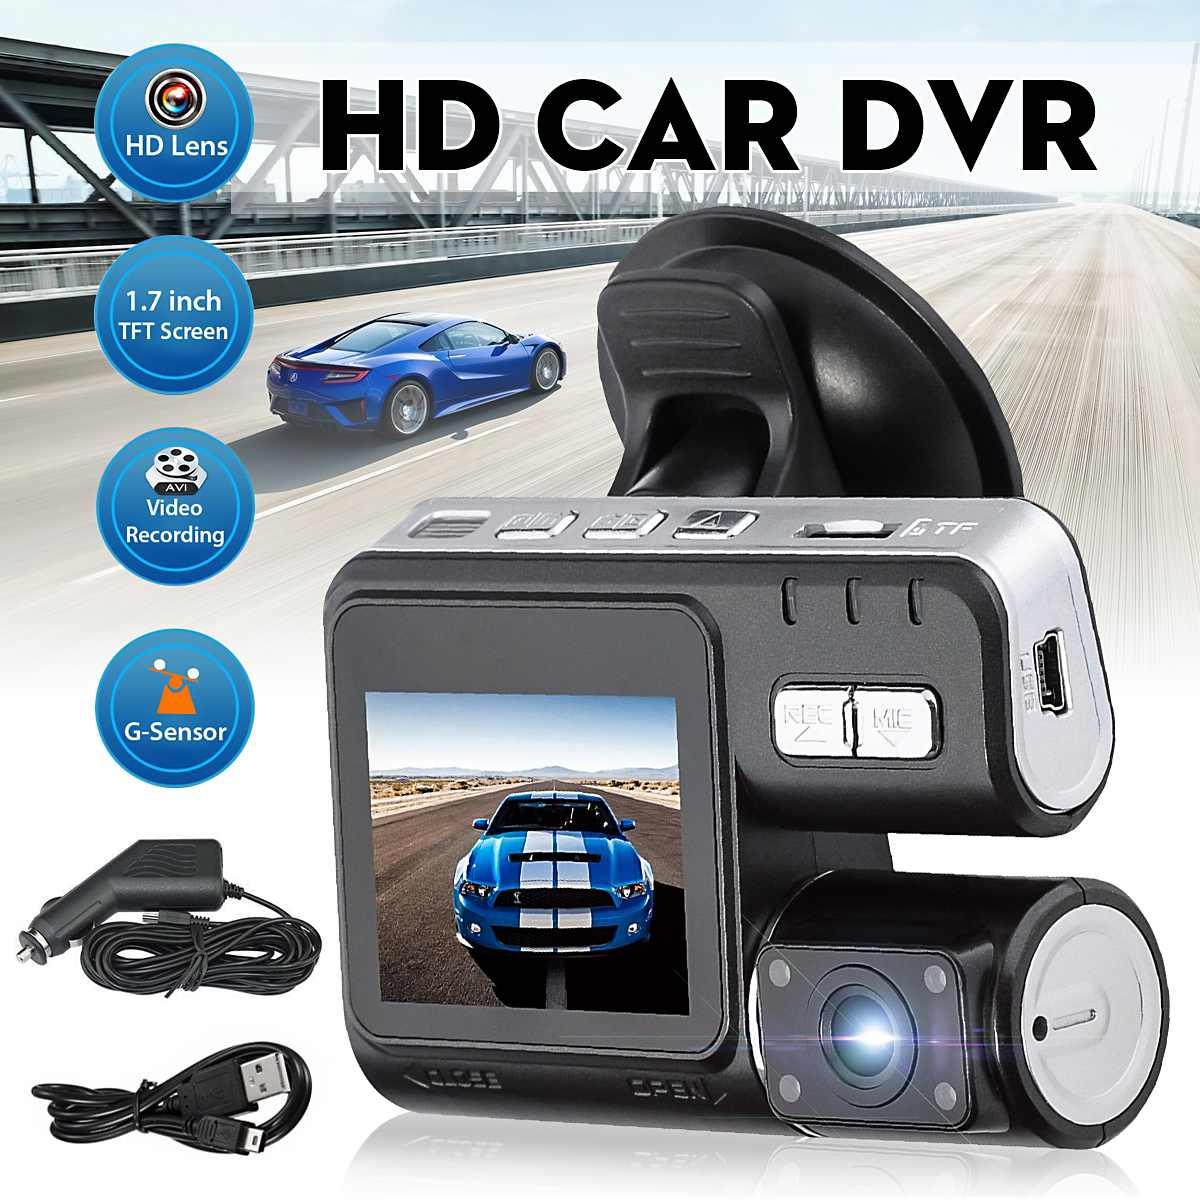 2,0 zoll 120 Grad HD Auto DVR Fahrzeug Kamera Video Dash Cam Front Recorder Kamera Nachtsicht G-sensor bis 32 GB